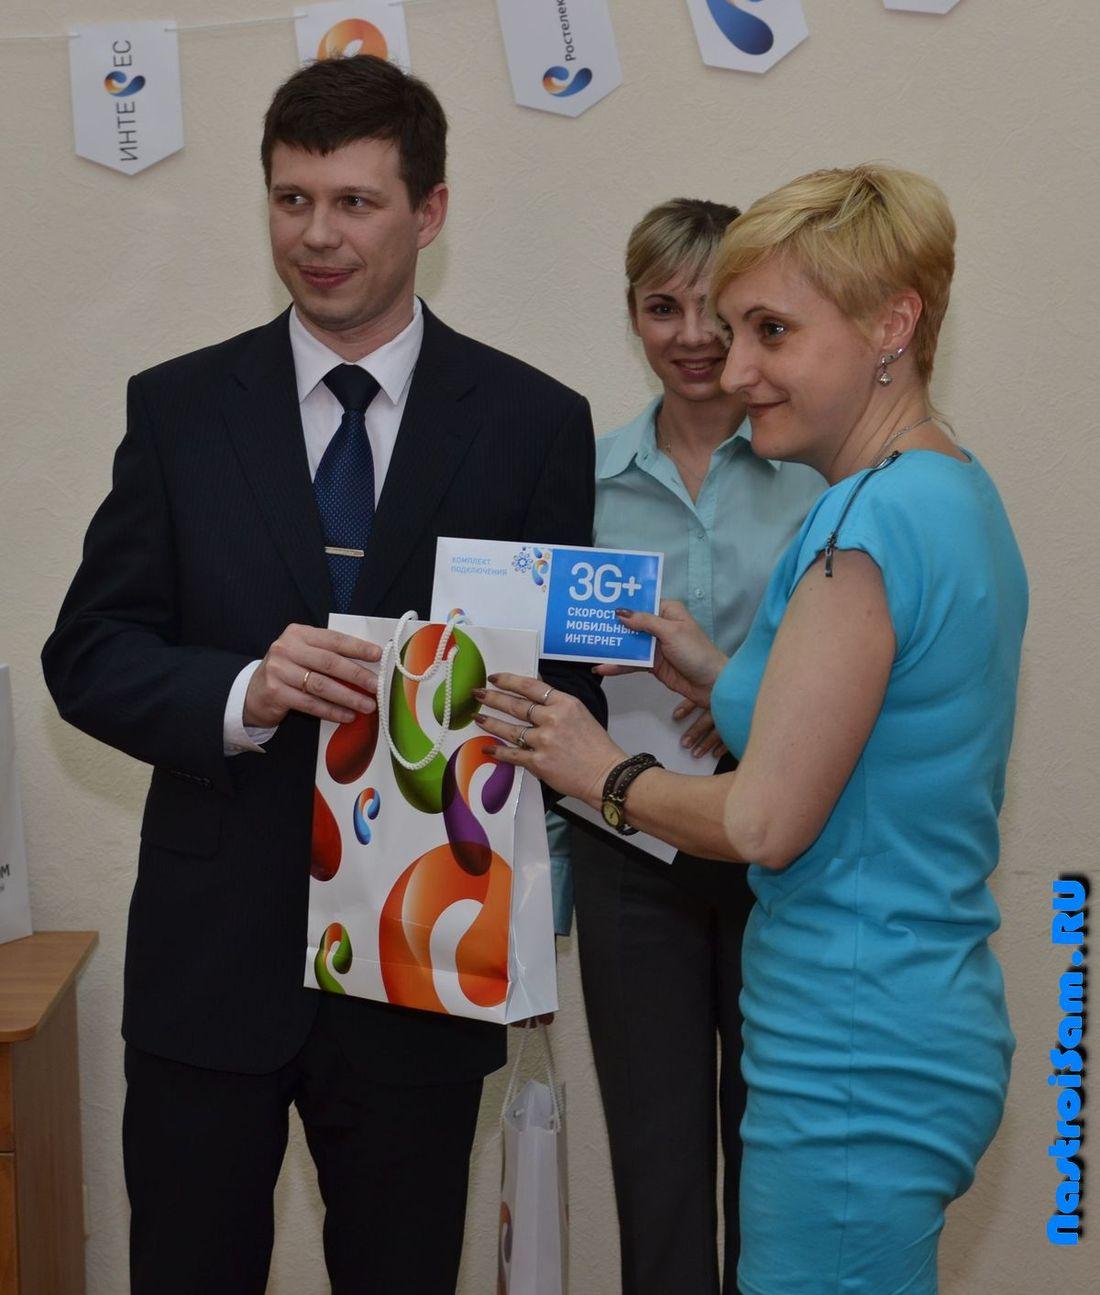 saratov_nss-3g_present-006